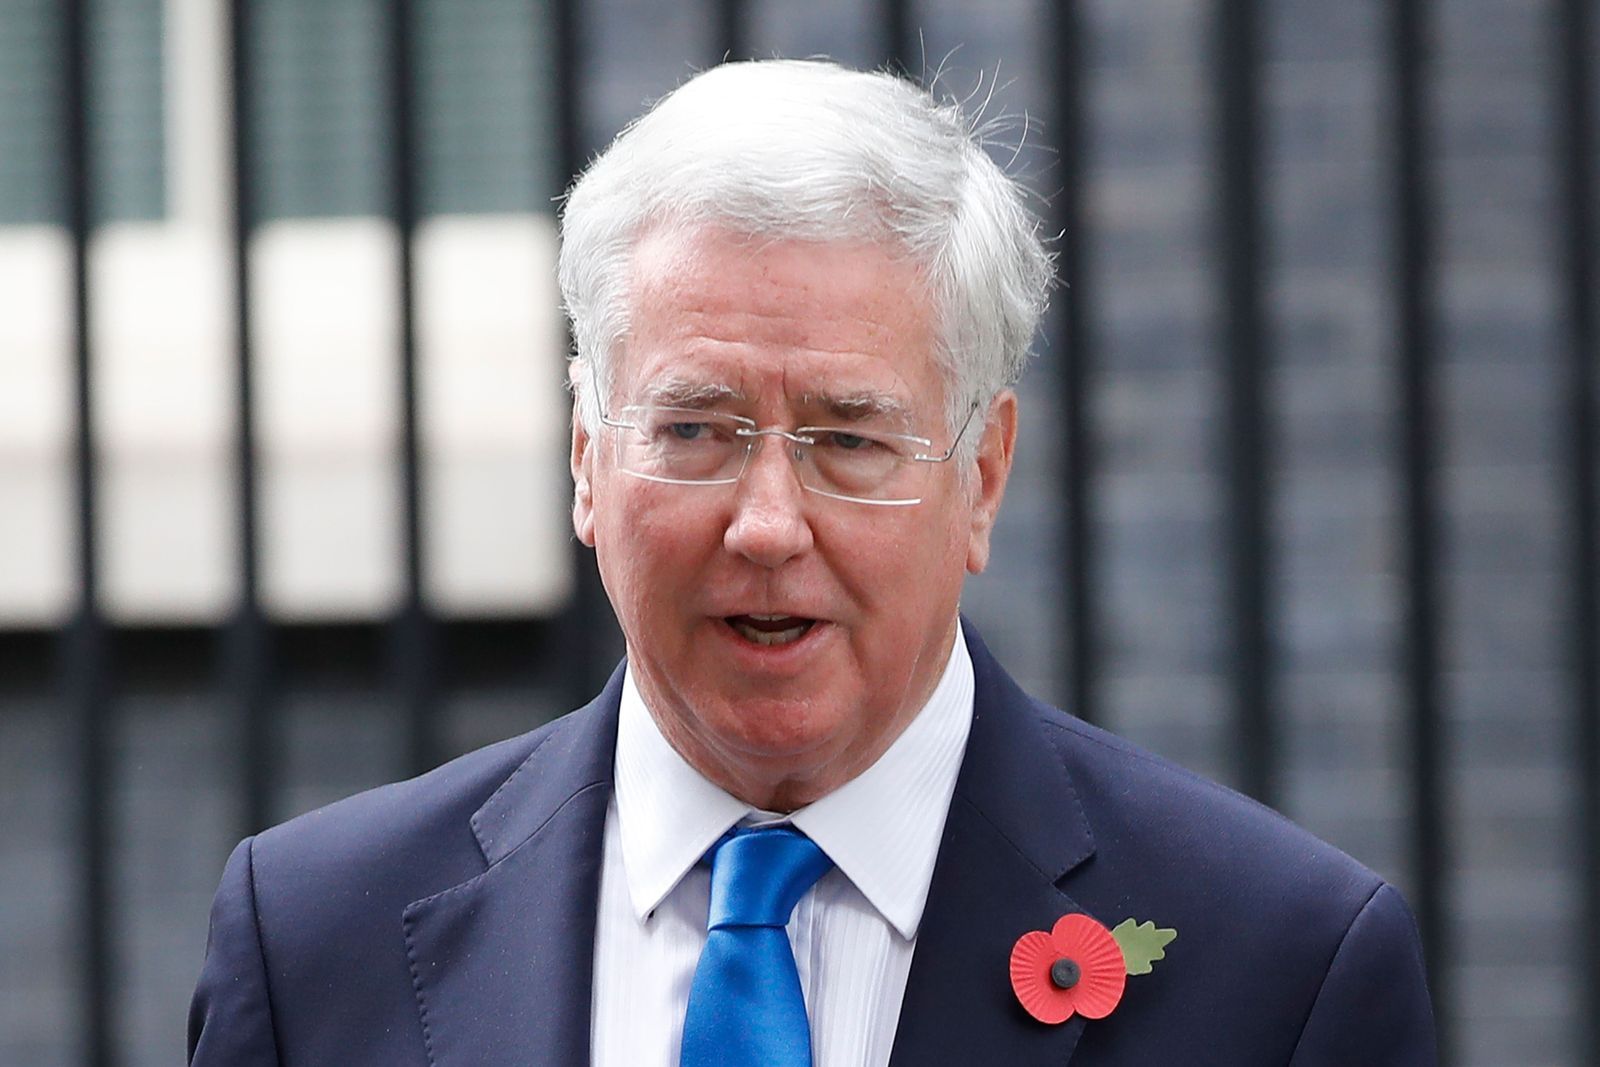 FILES-BRITAIN-POLITICS-ABUSE